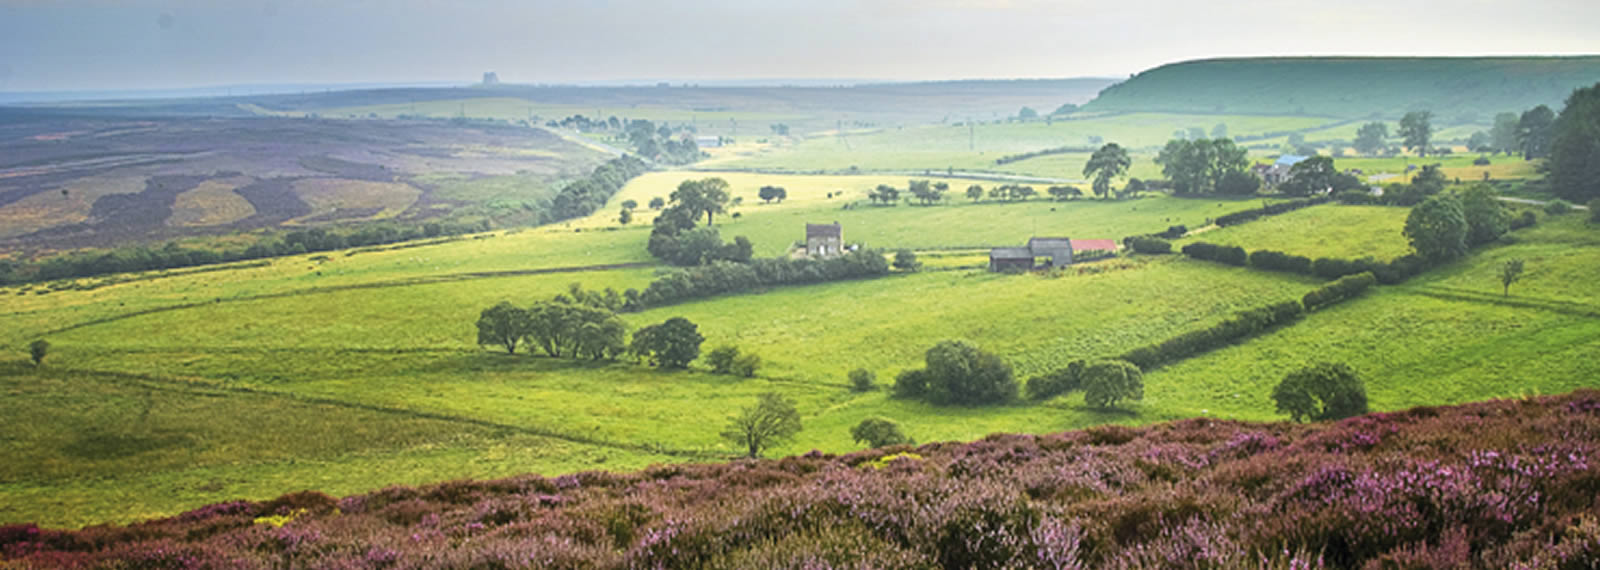 Hawnby, North Yorkshire